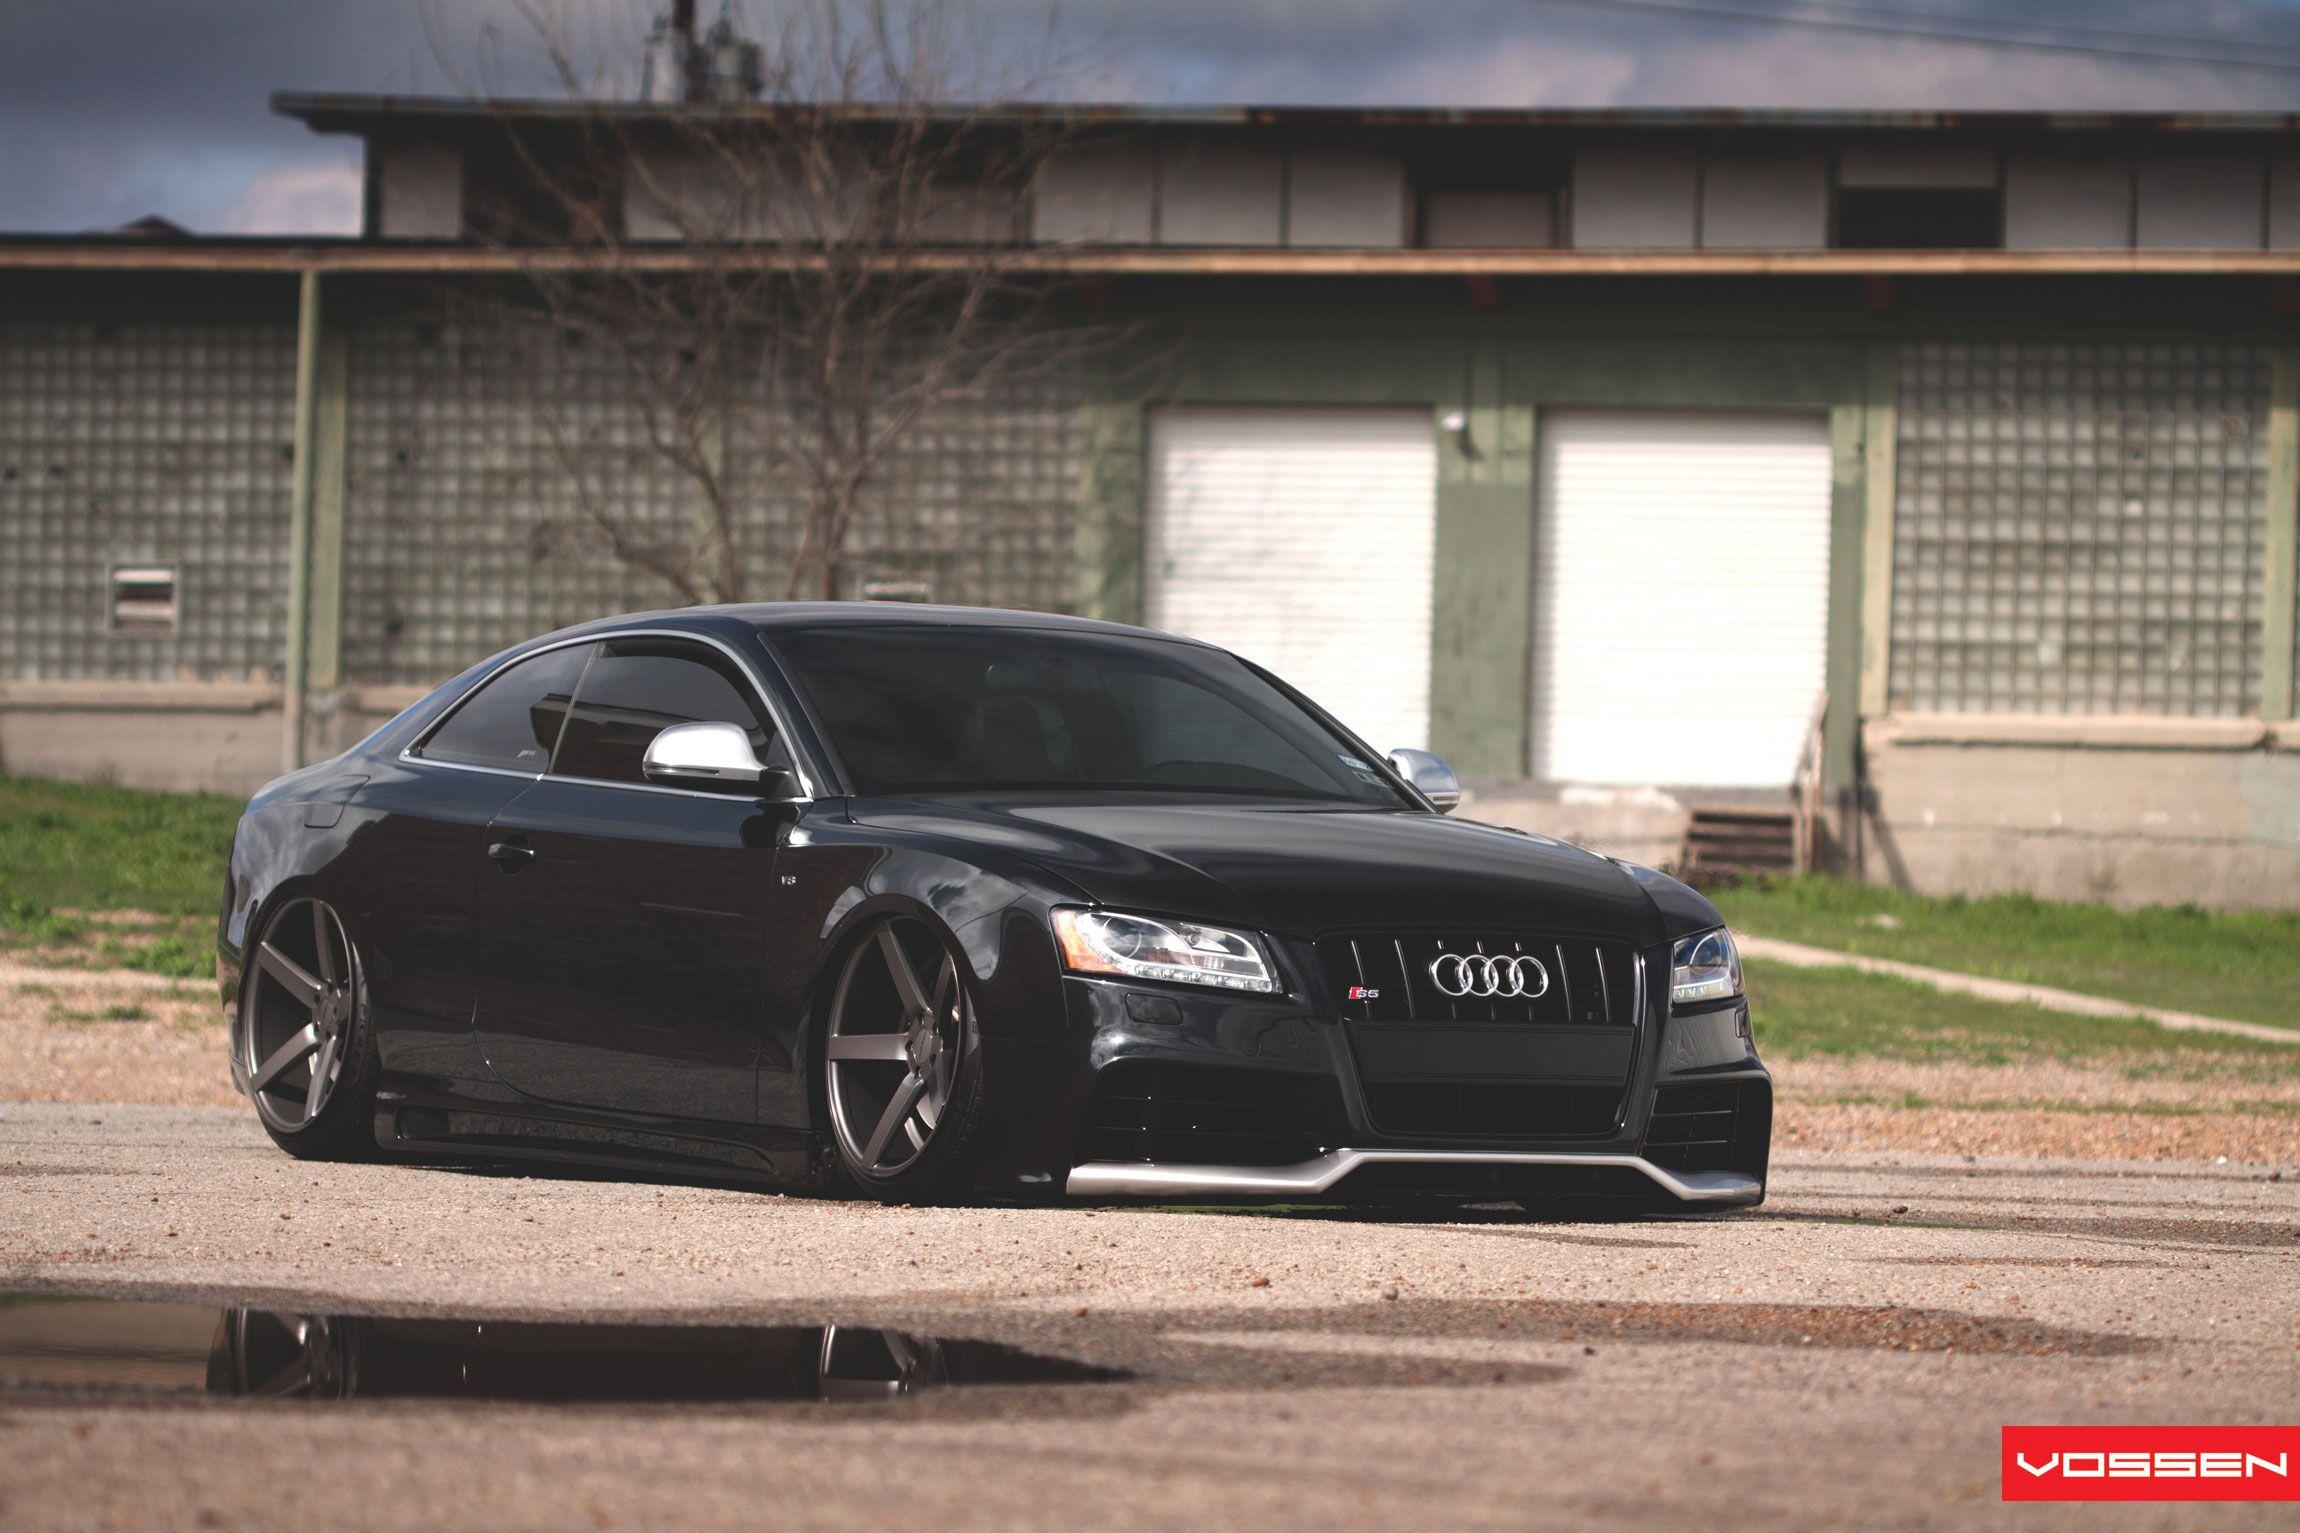 Audi q7 suv vossen wheels tuning cars wallpaper - Audi Air Suspension Slammed With Vossen Rims